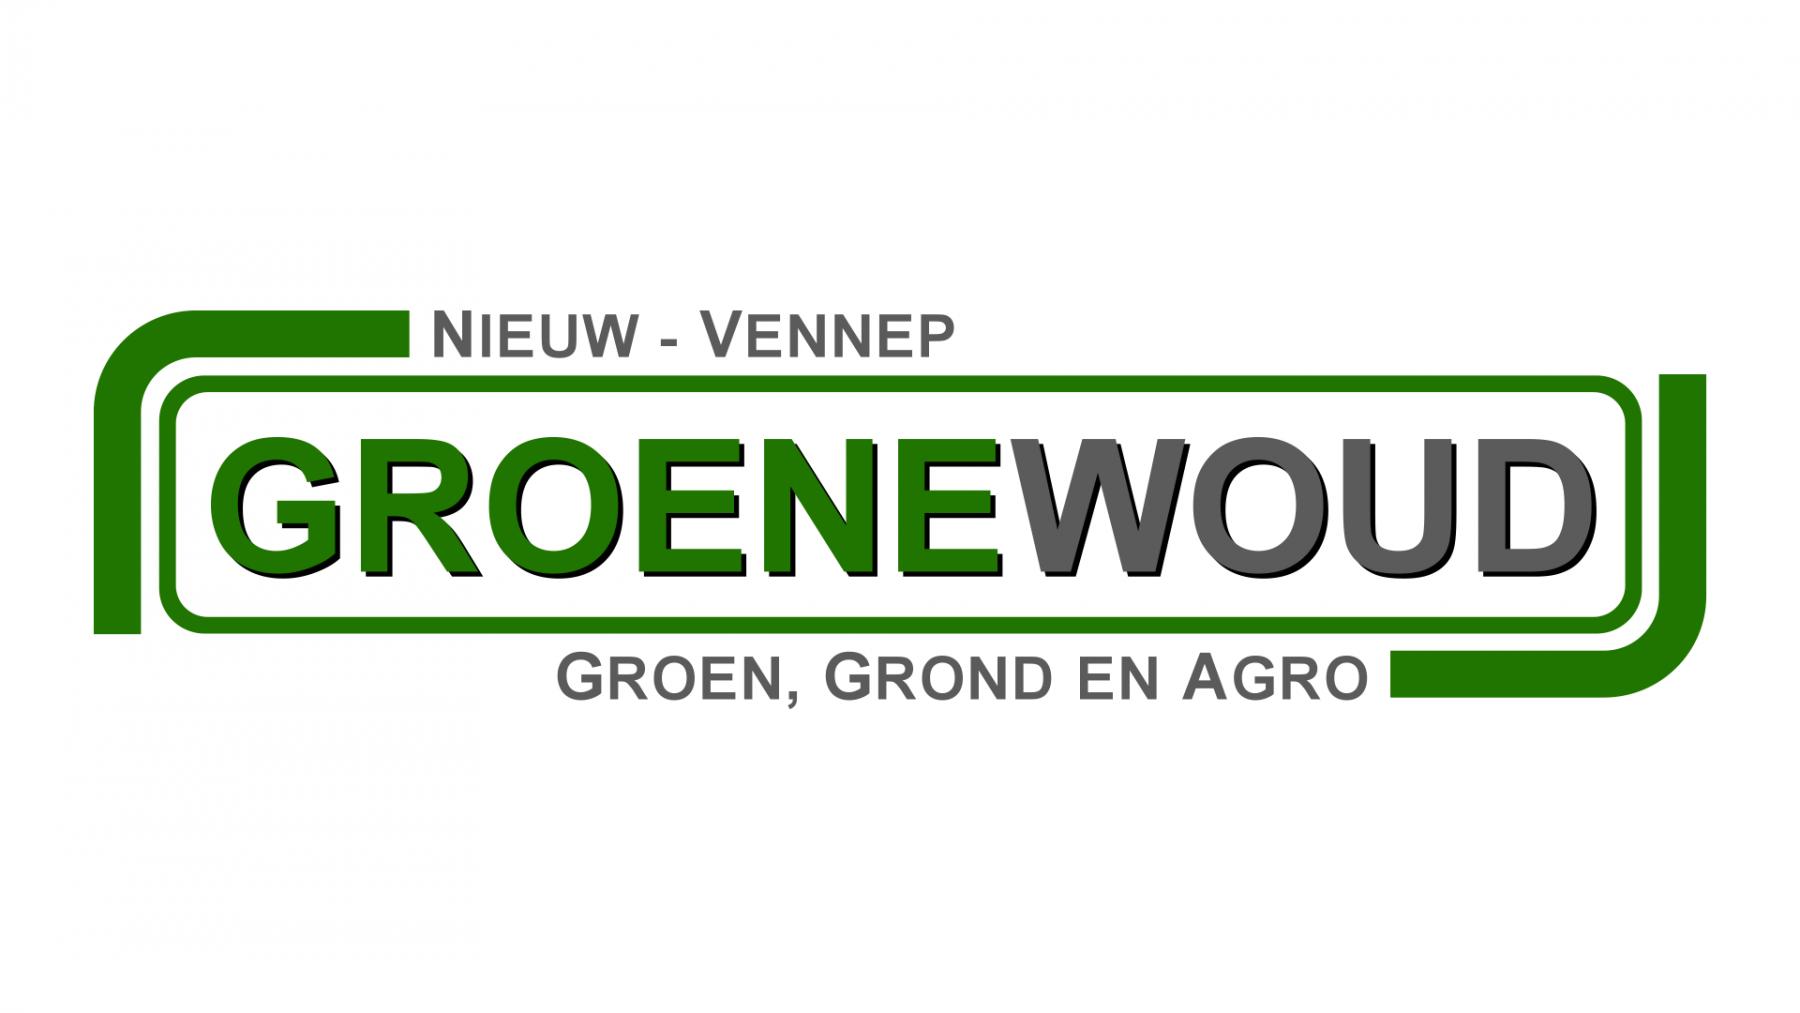 Groenewoud-Groen-Grond-Agro.fw_